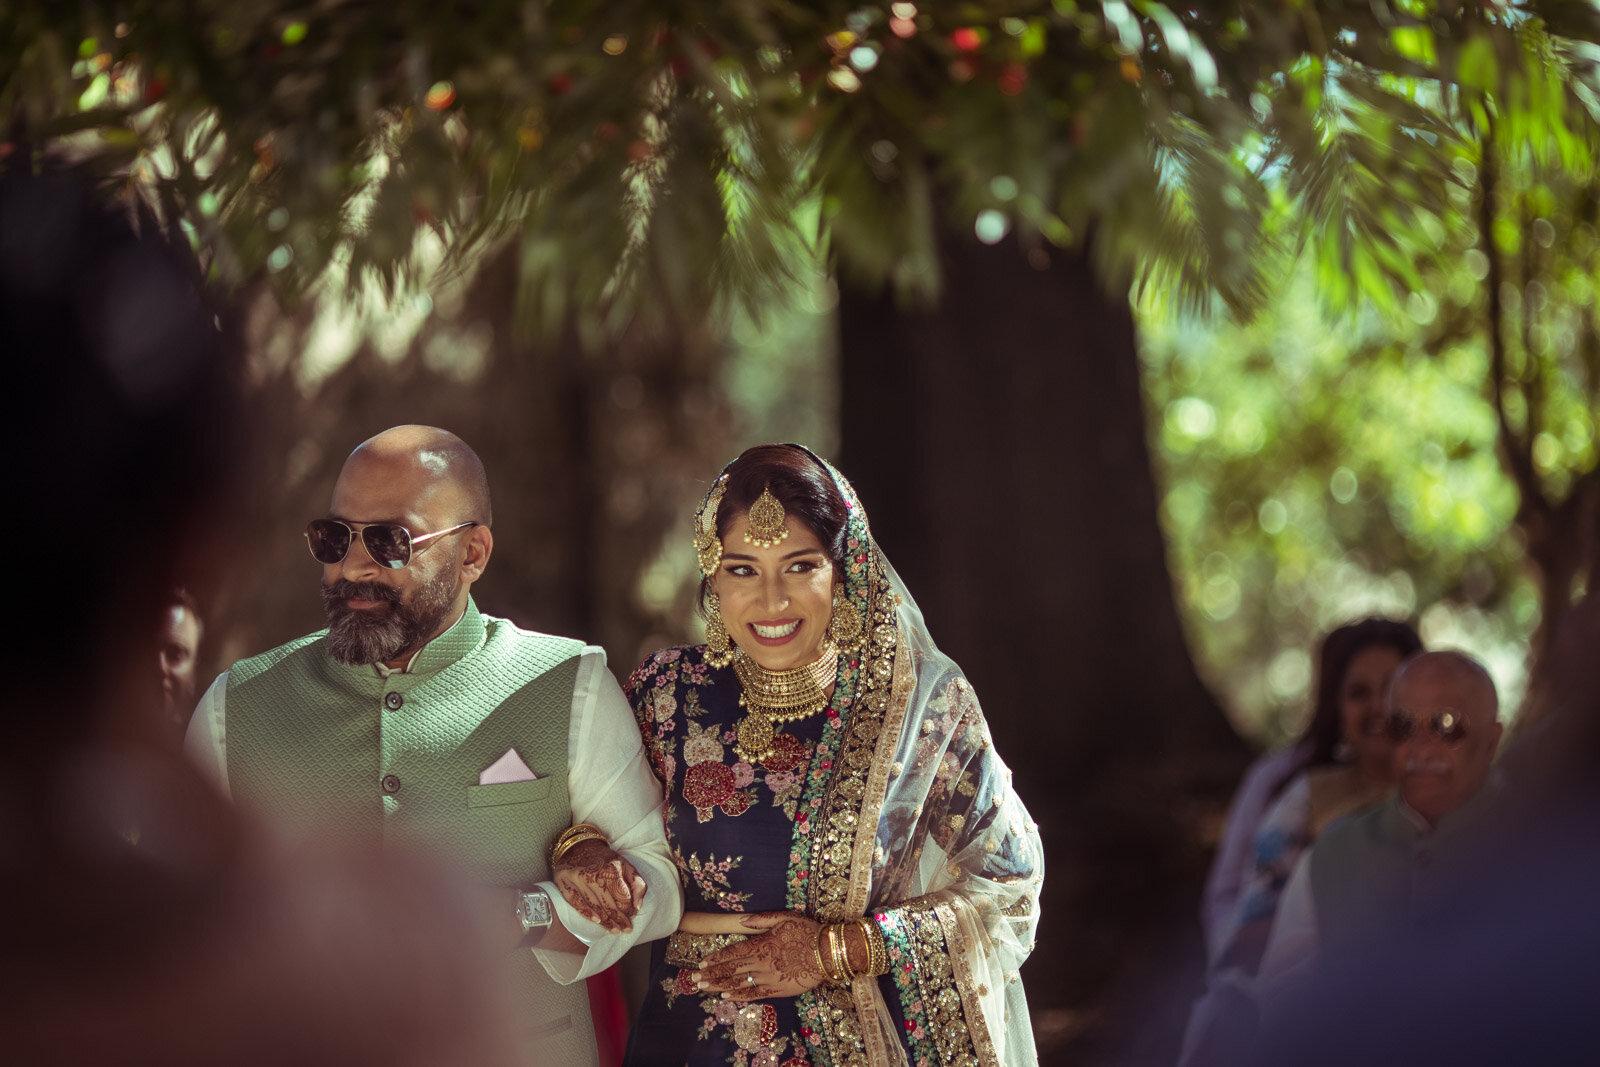 Destination Indian Wedding in Borgo San Faustino 12.jpg